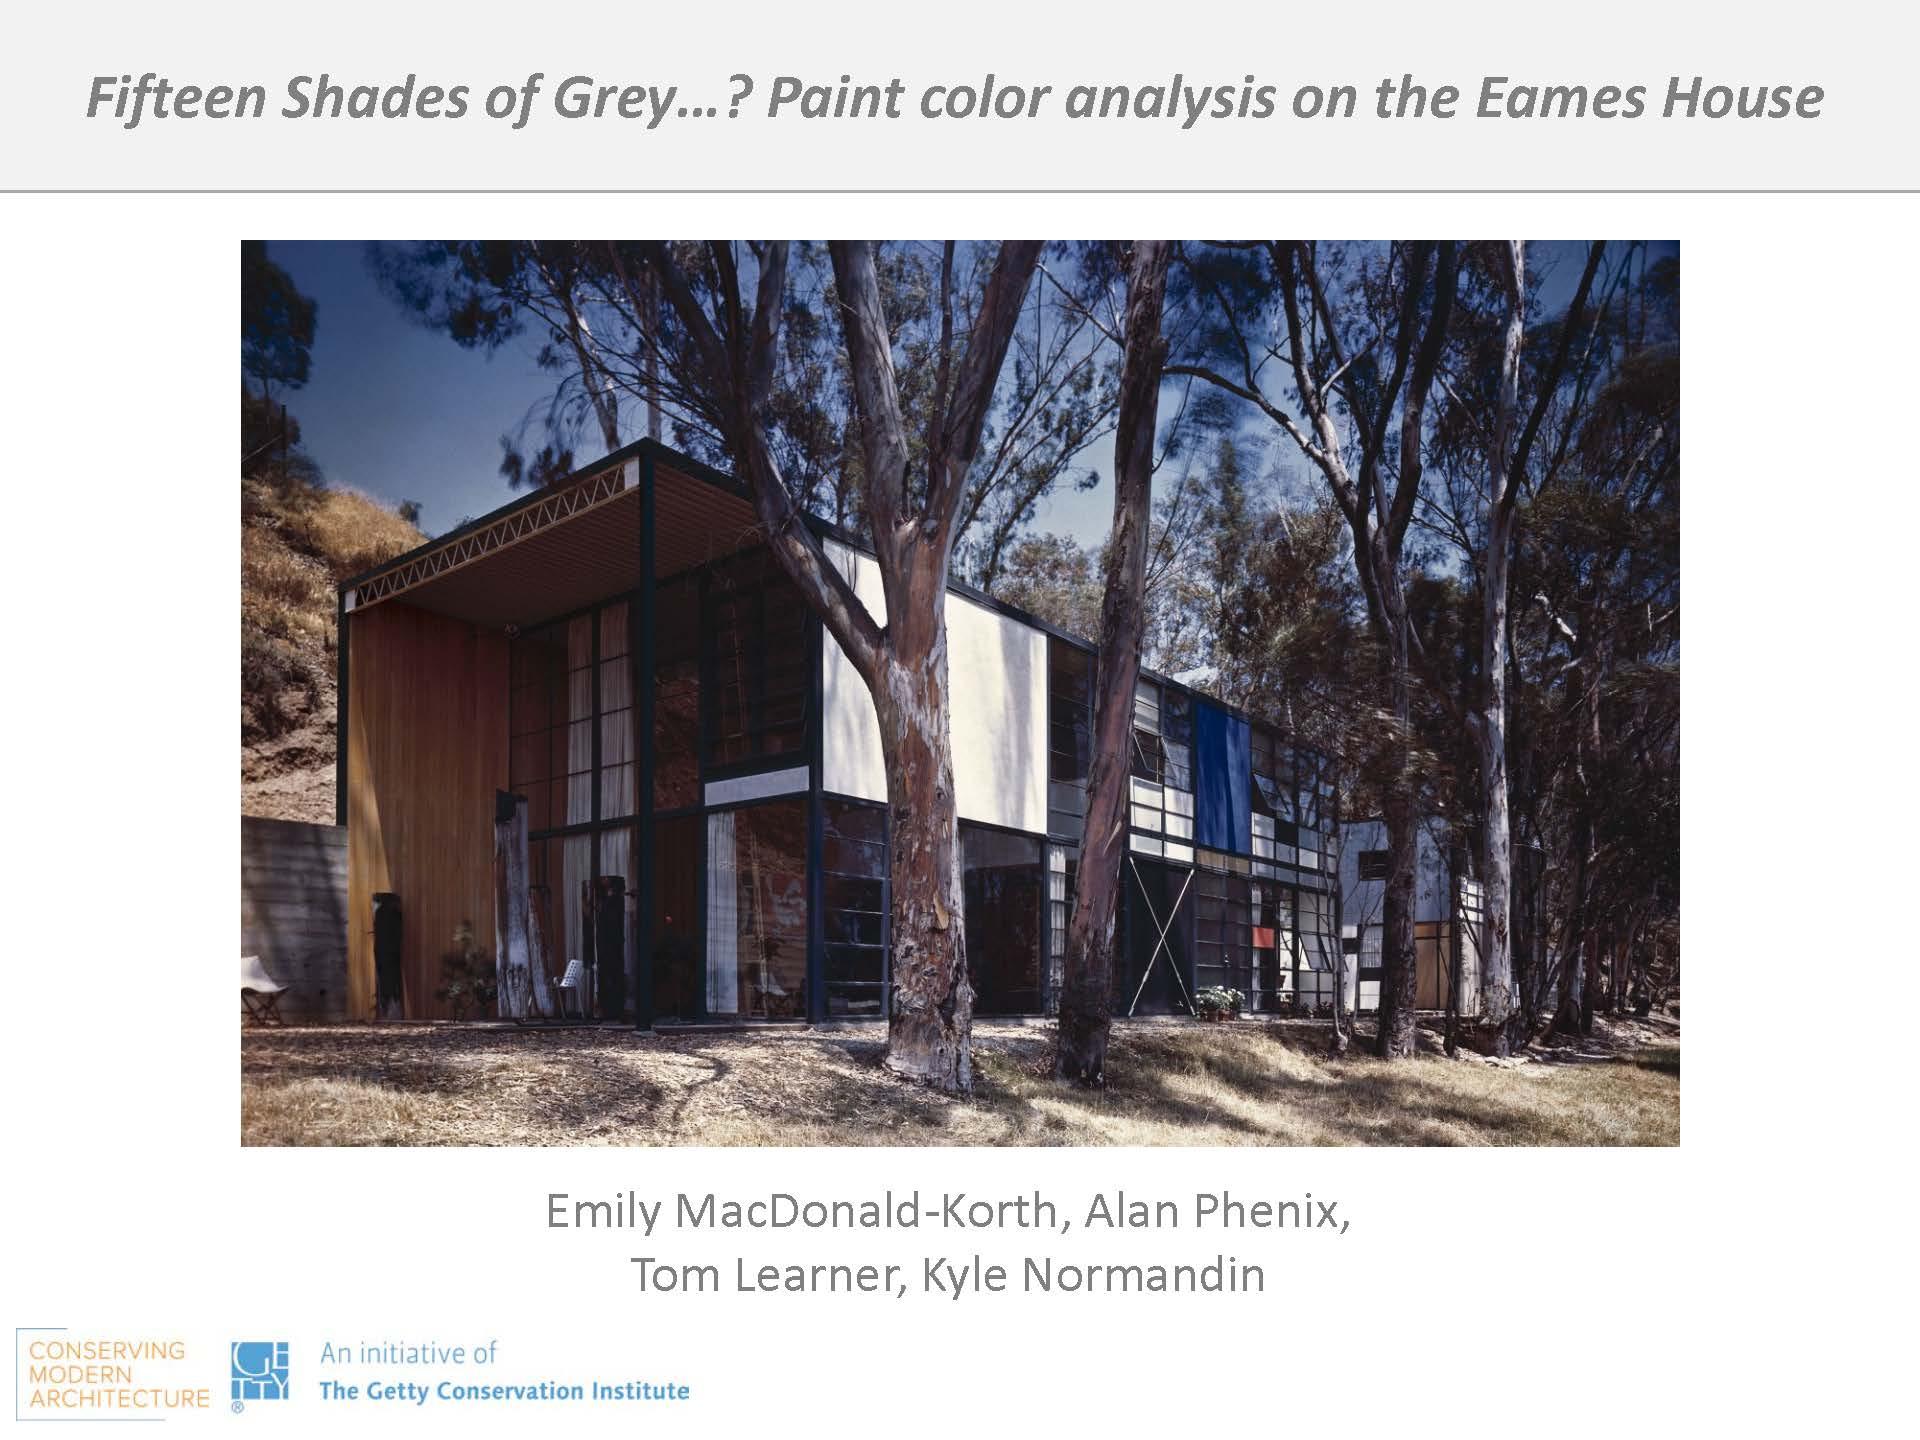 MacDonald-Korth_Eames Paint_AIC 2013_Page_01.jpg